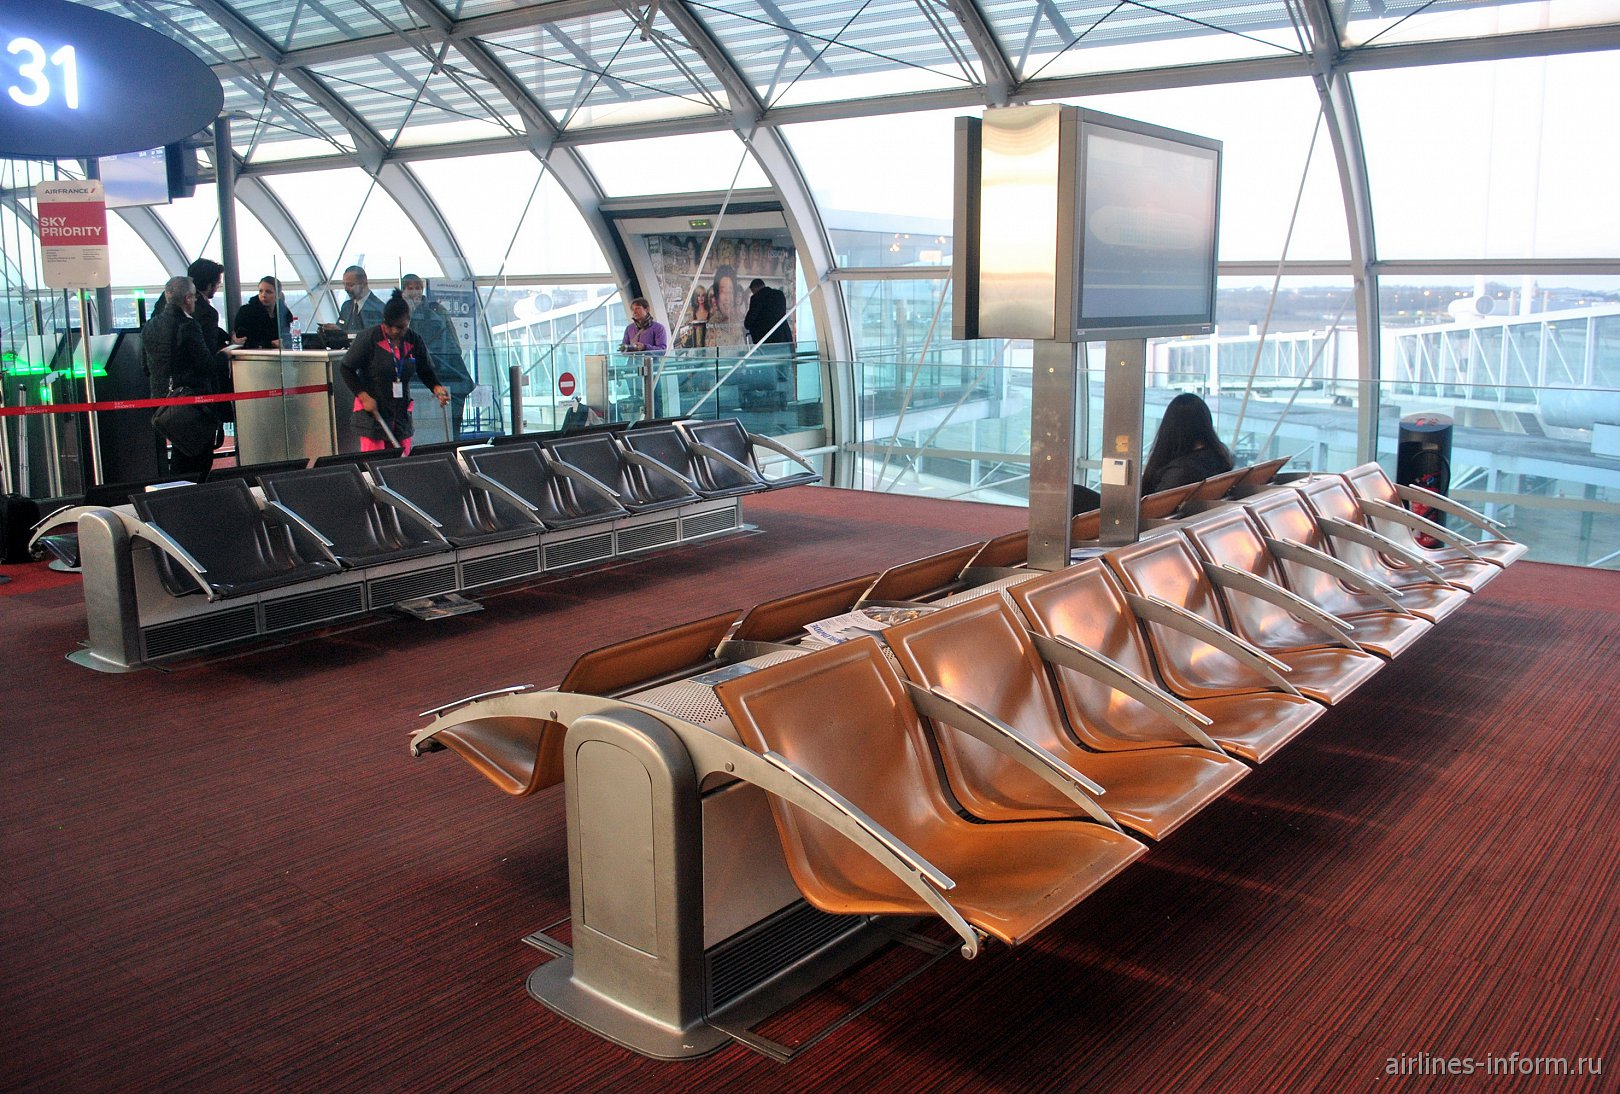 Места для ожидания посадки в конкорсе F терминала 2 аэропорта Париж Шарль-де-Голль